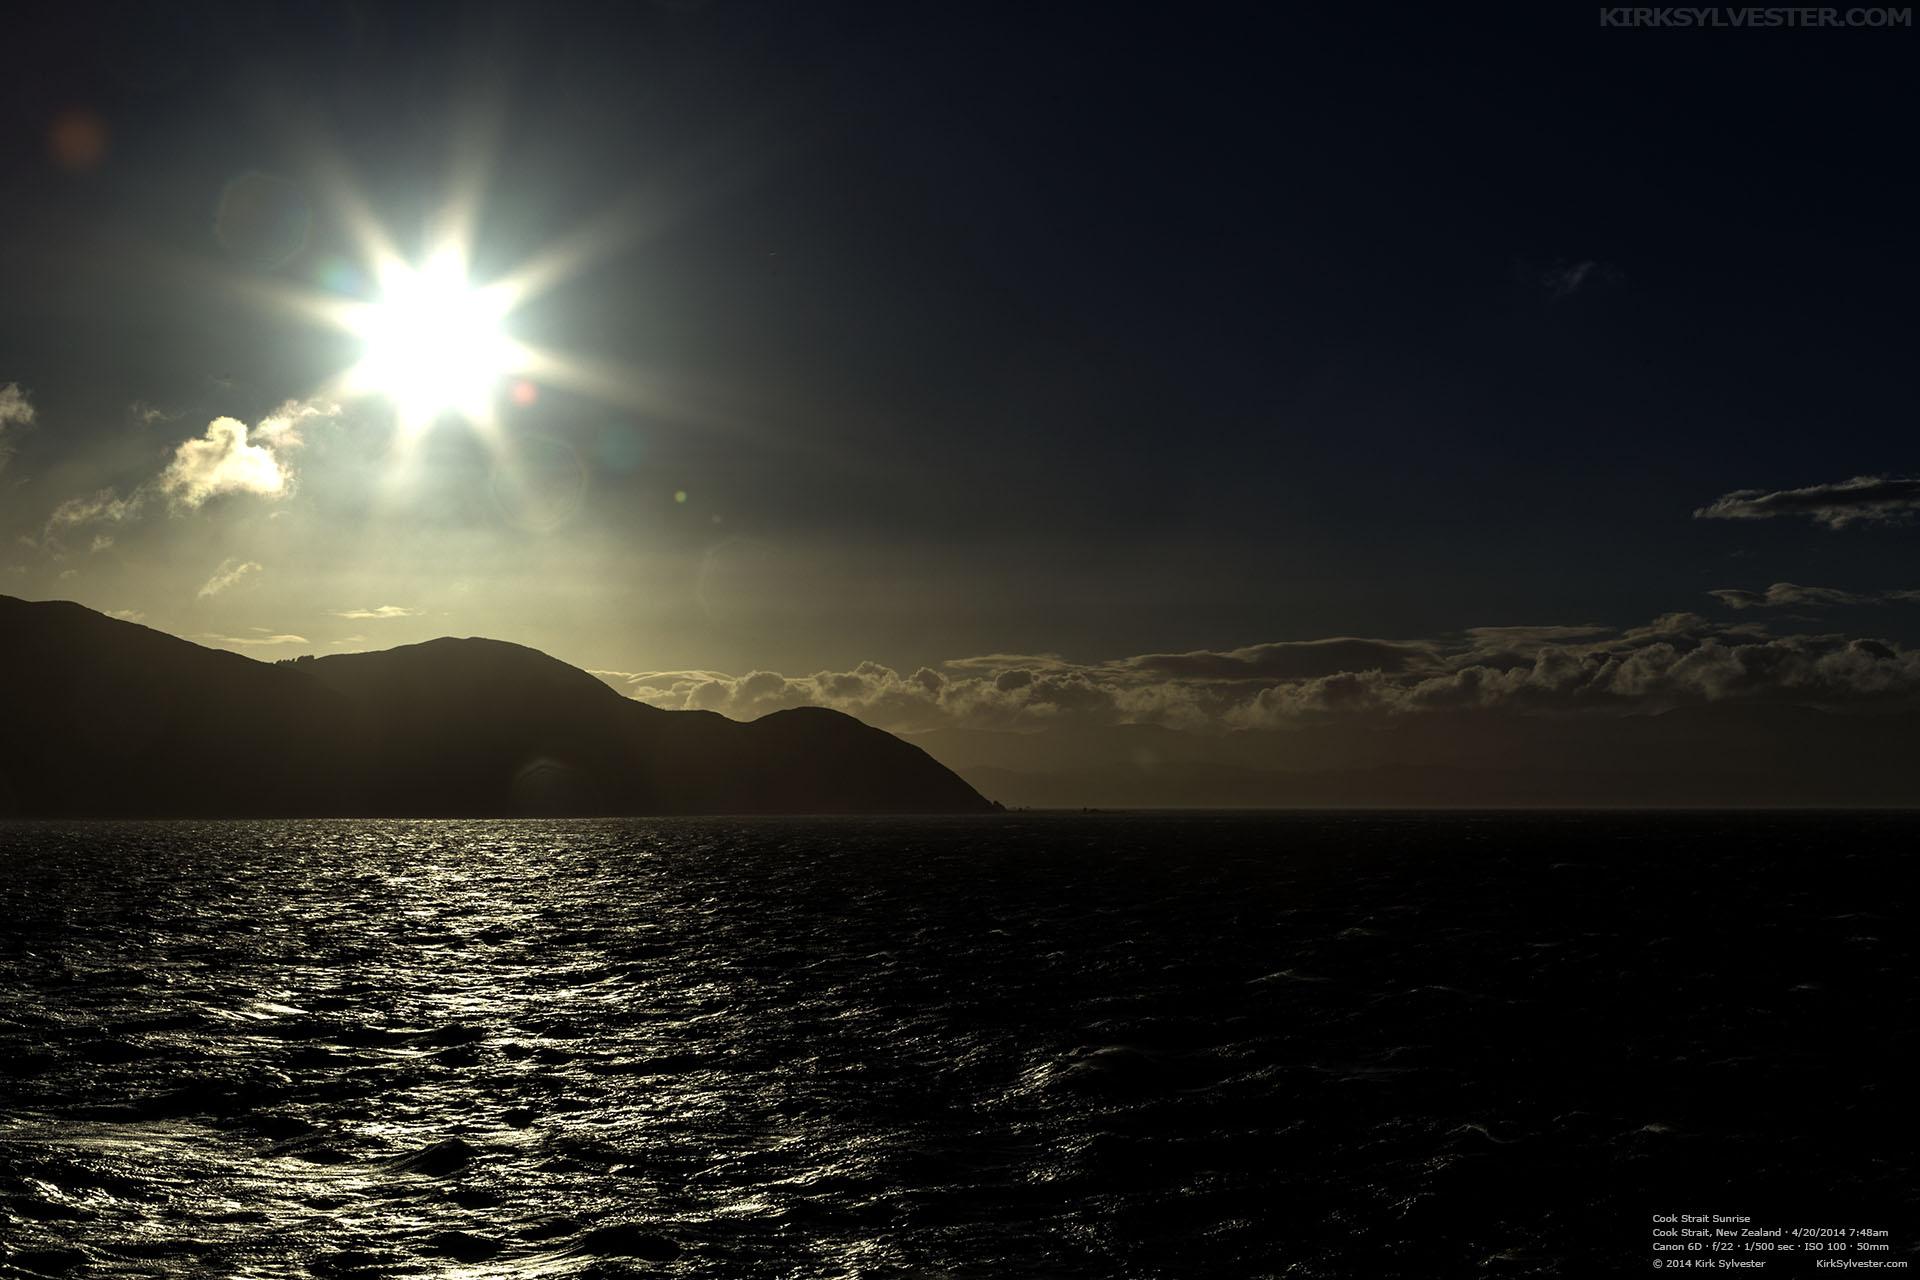 Cook Strait Sunrise (Photo by Kirk Sylvester)